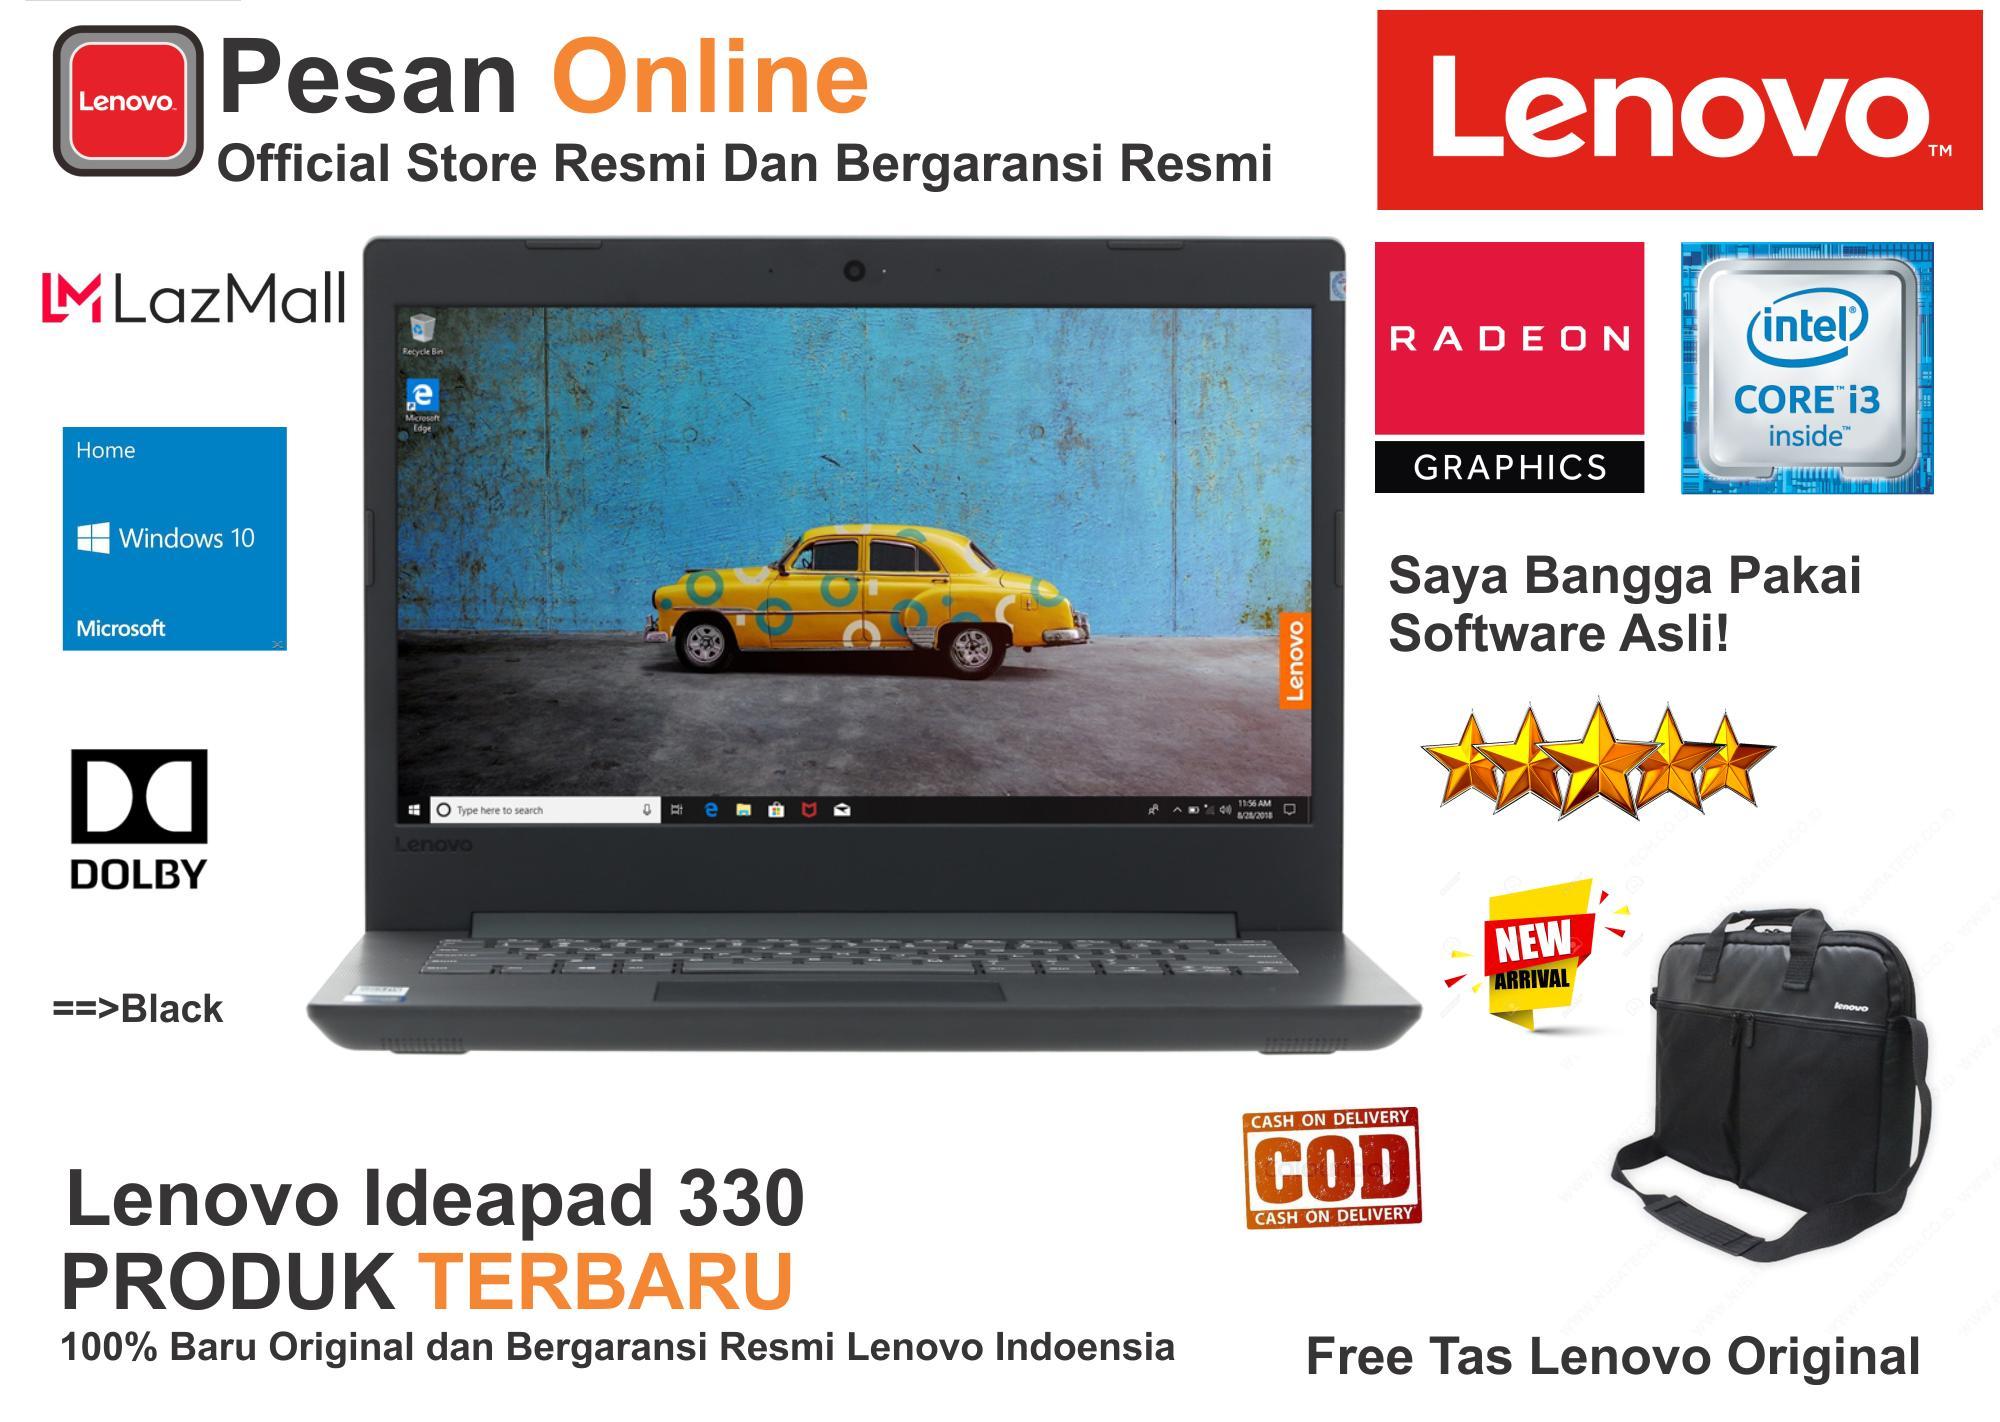 https://www.lazada.co.id/products/new-arrival-lenovo-ideapad-330-core-i3-7020u-4-gb-ram-1-tb-hdd-14-inch-hd-anti-glare-vga-radeon-m530-2-gb-dvdvrw-windows-10-ip330-garansi-resmi-lenovo-indonesia-i805808750-s1139832229.html